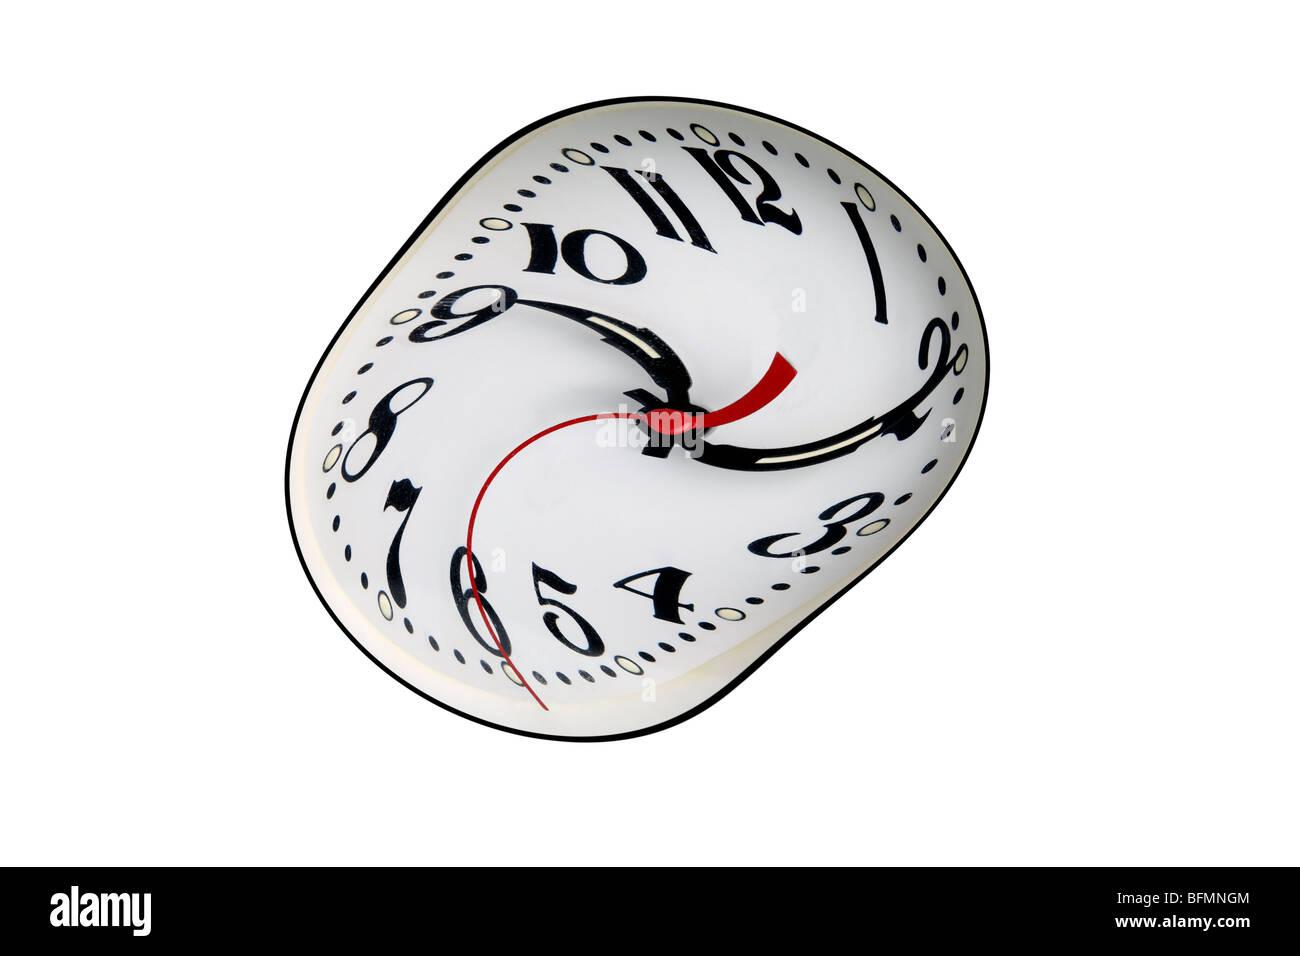 Time warp, conceptual artwork - Stock Image